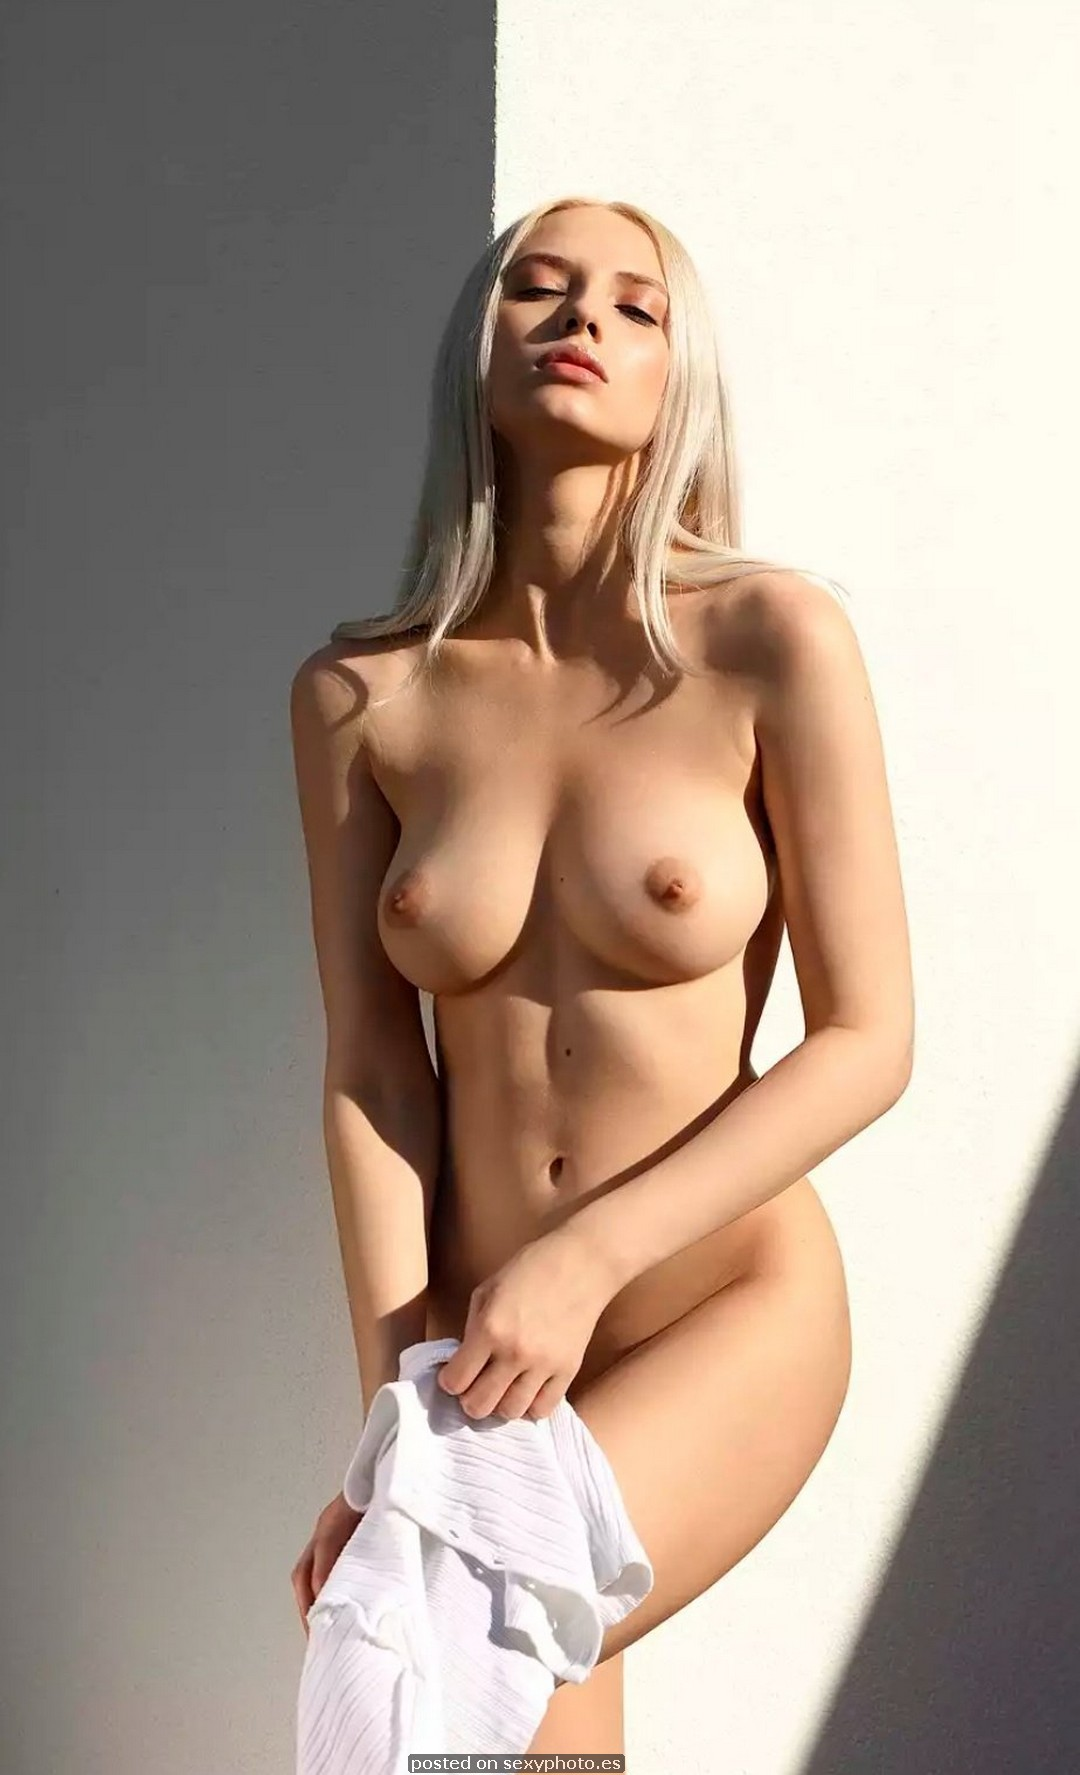 addison rose pantyhose erotica